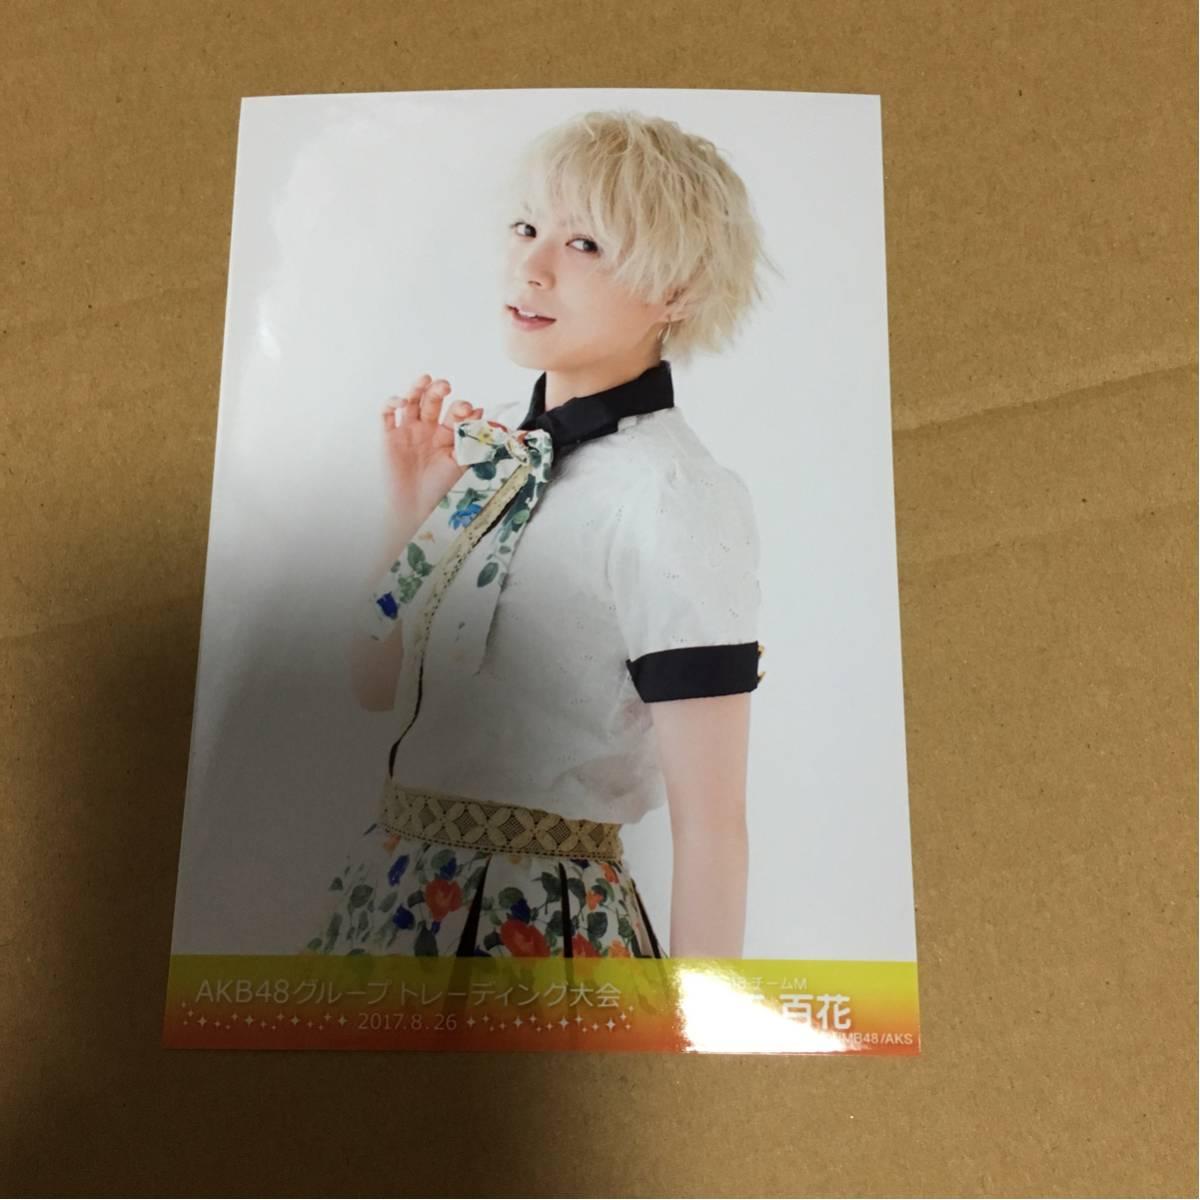 AKB48 グループ トレーディング大会 8月 NMB 木下百花 ライブ・総選挙グッズの画像